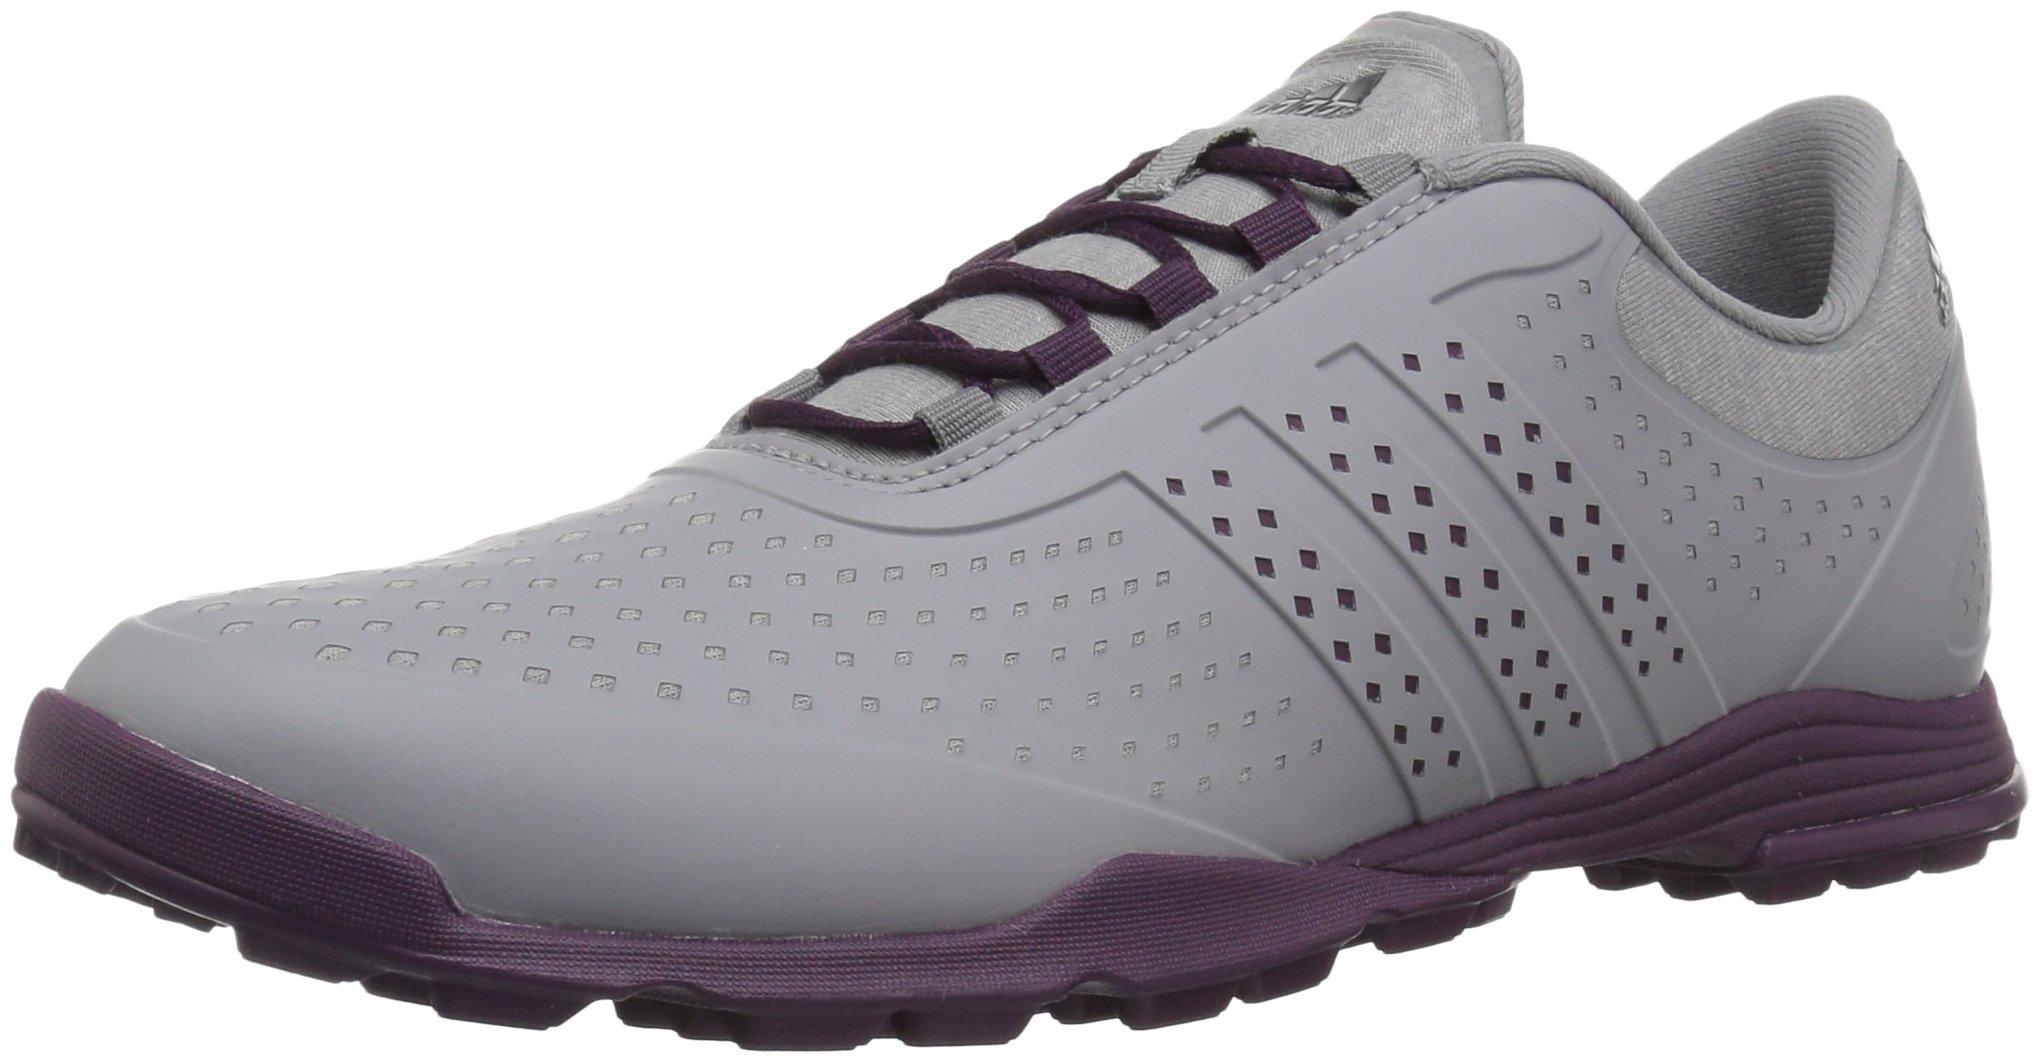 adidas Women's Adipure Sport Golf Shoe, Grey/Red Night, 9.5 M US